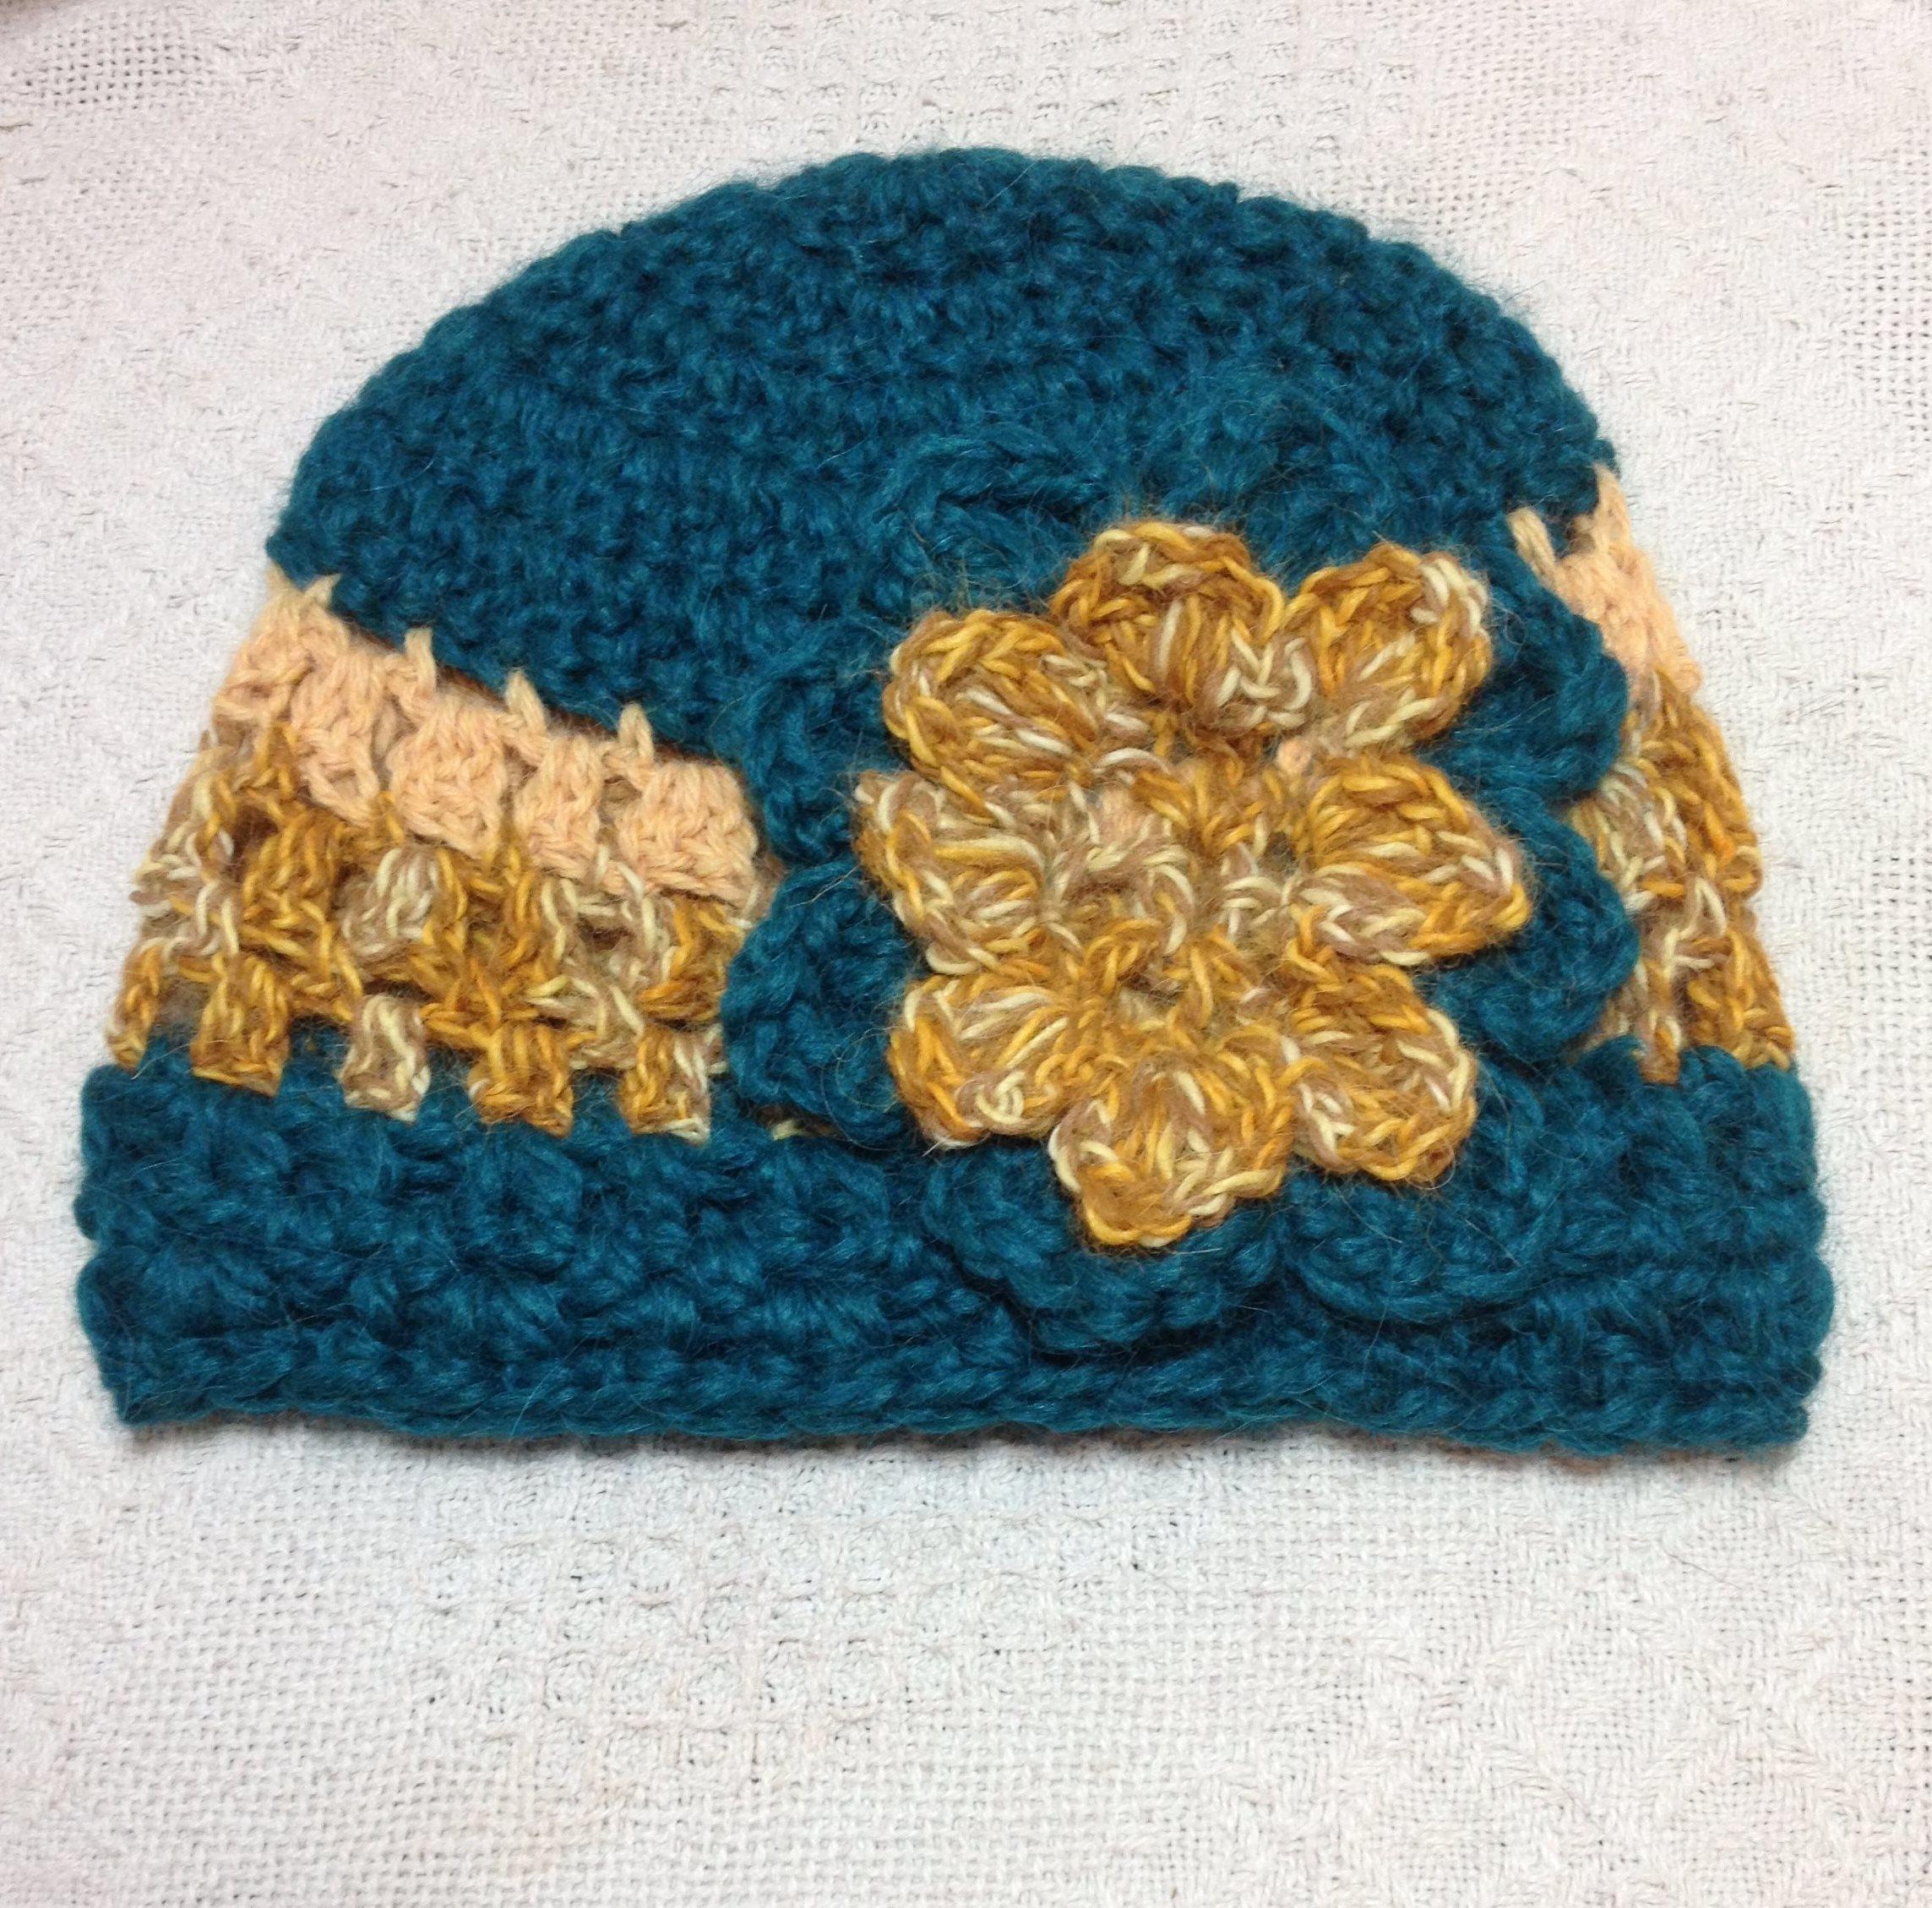 Alpaca Hat - Green, Gold, with Flower 17795